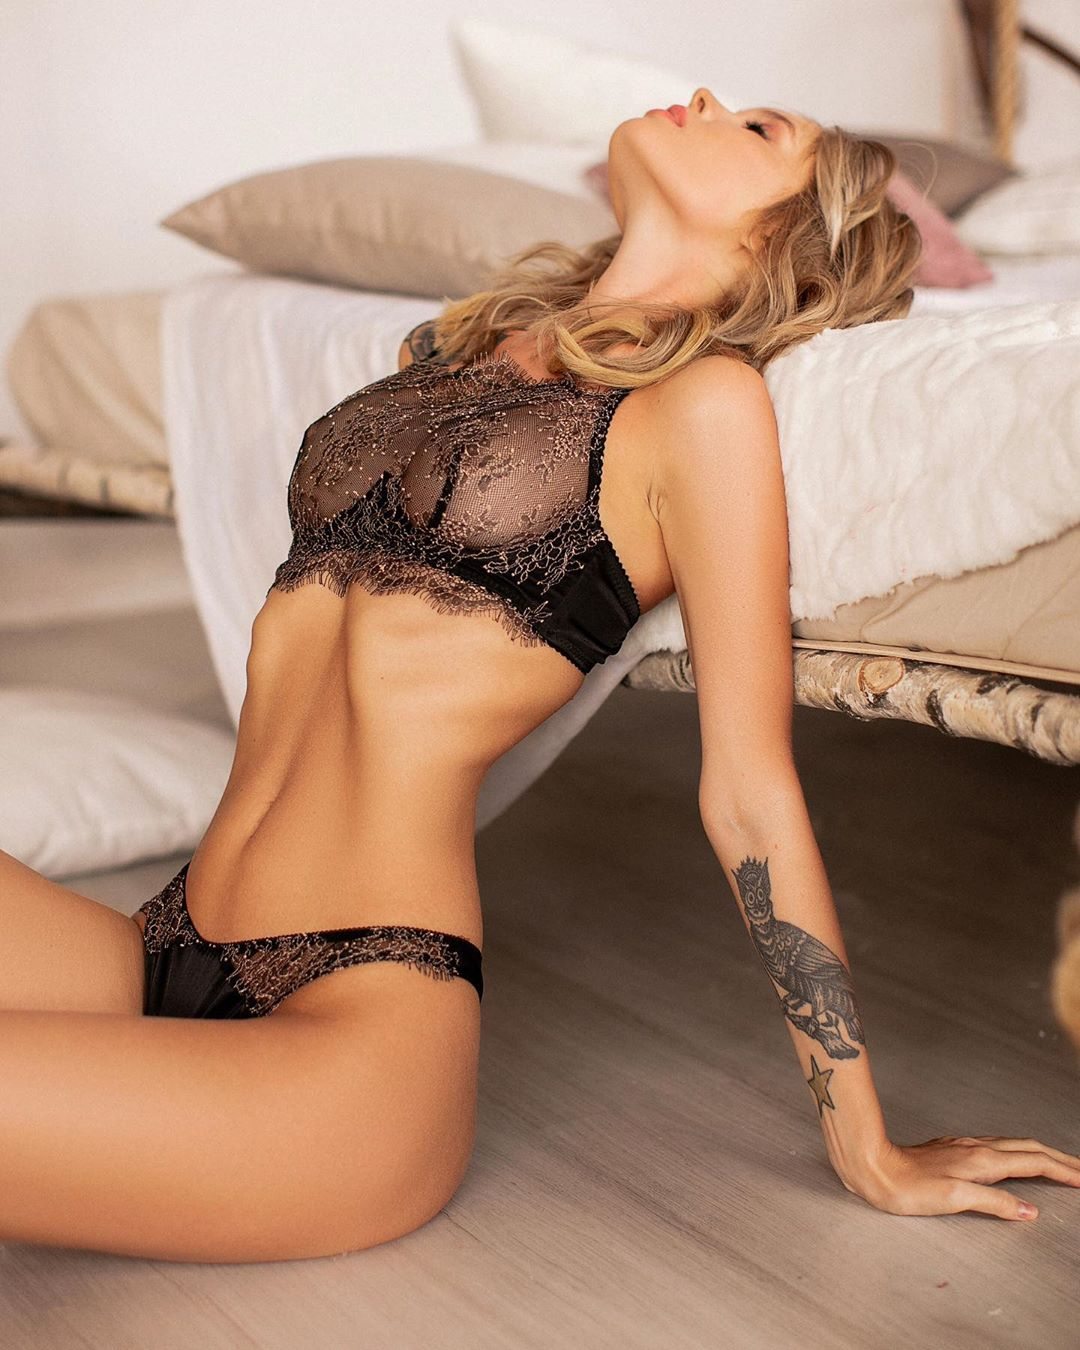 Ph Natalya Minaeva for Lady's Showroom / модель Анастасия Щеглова